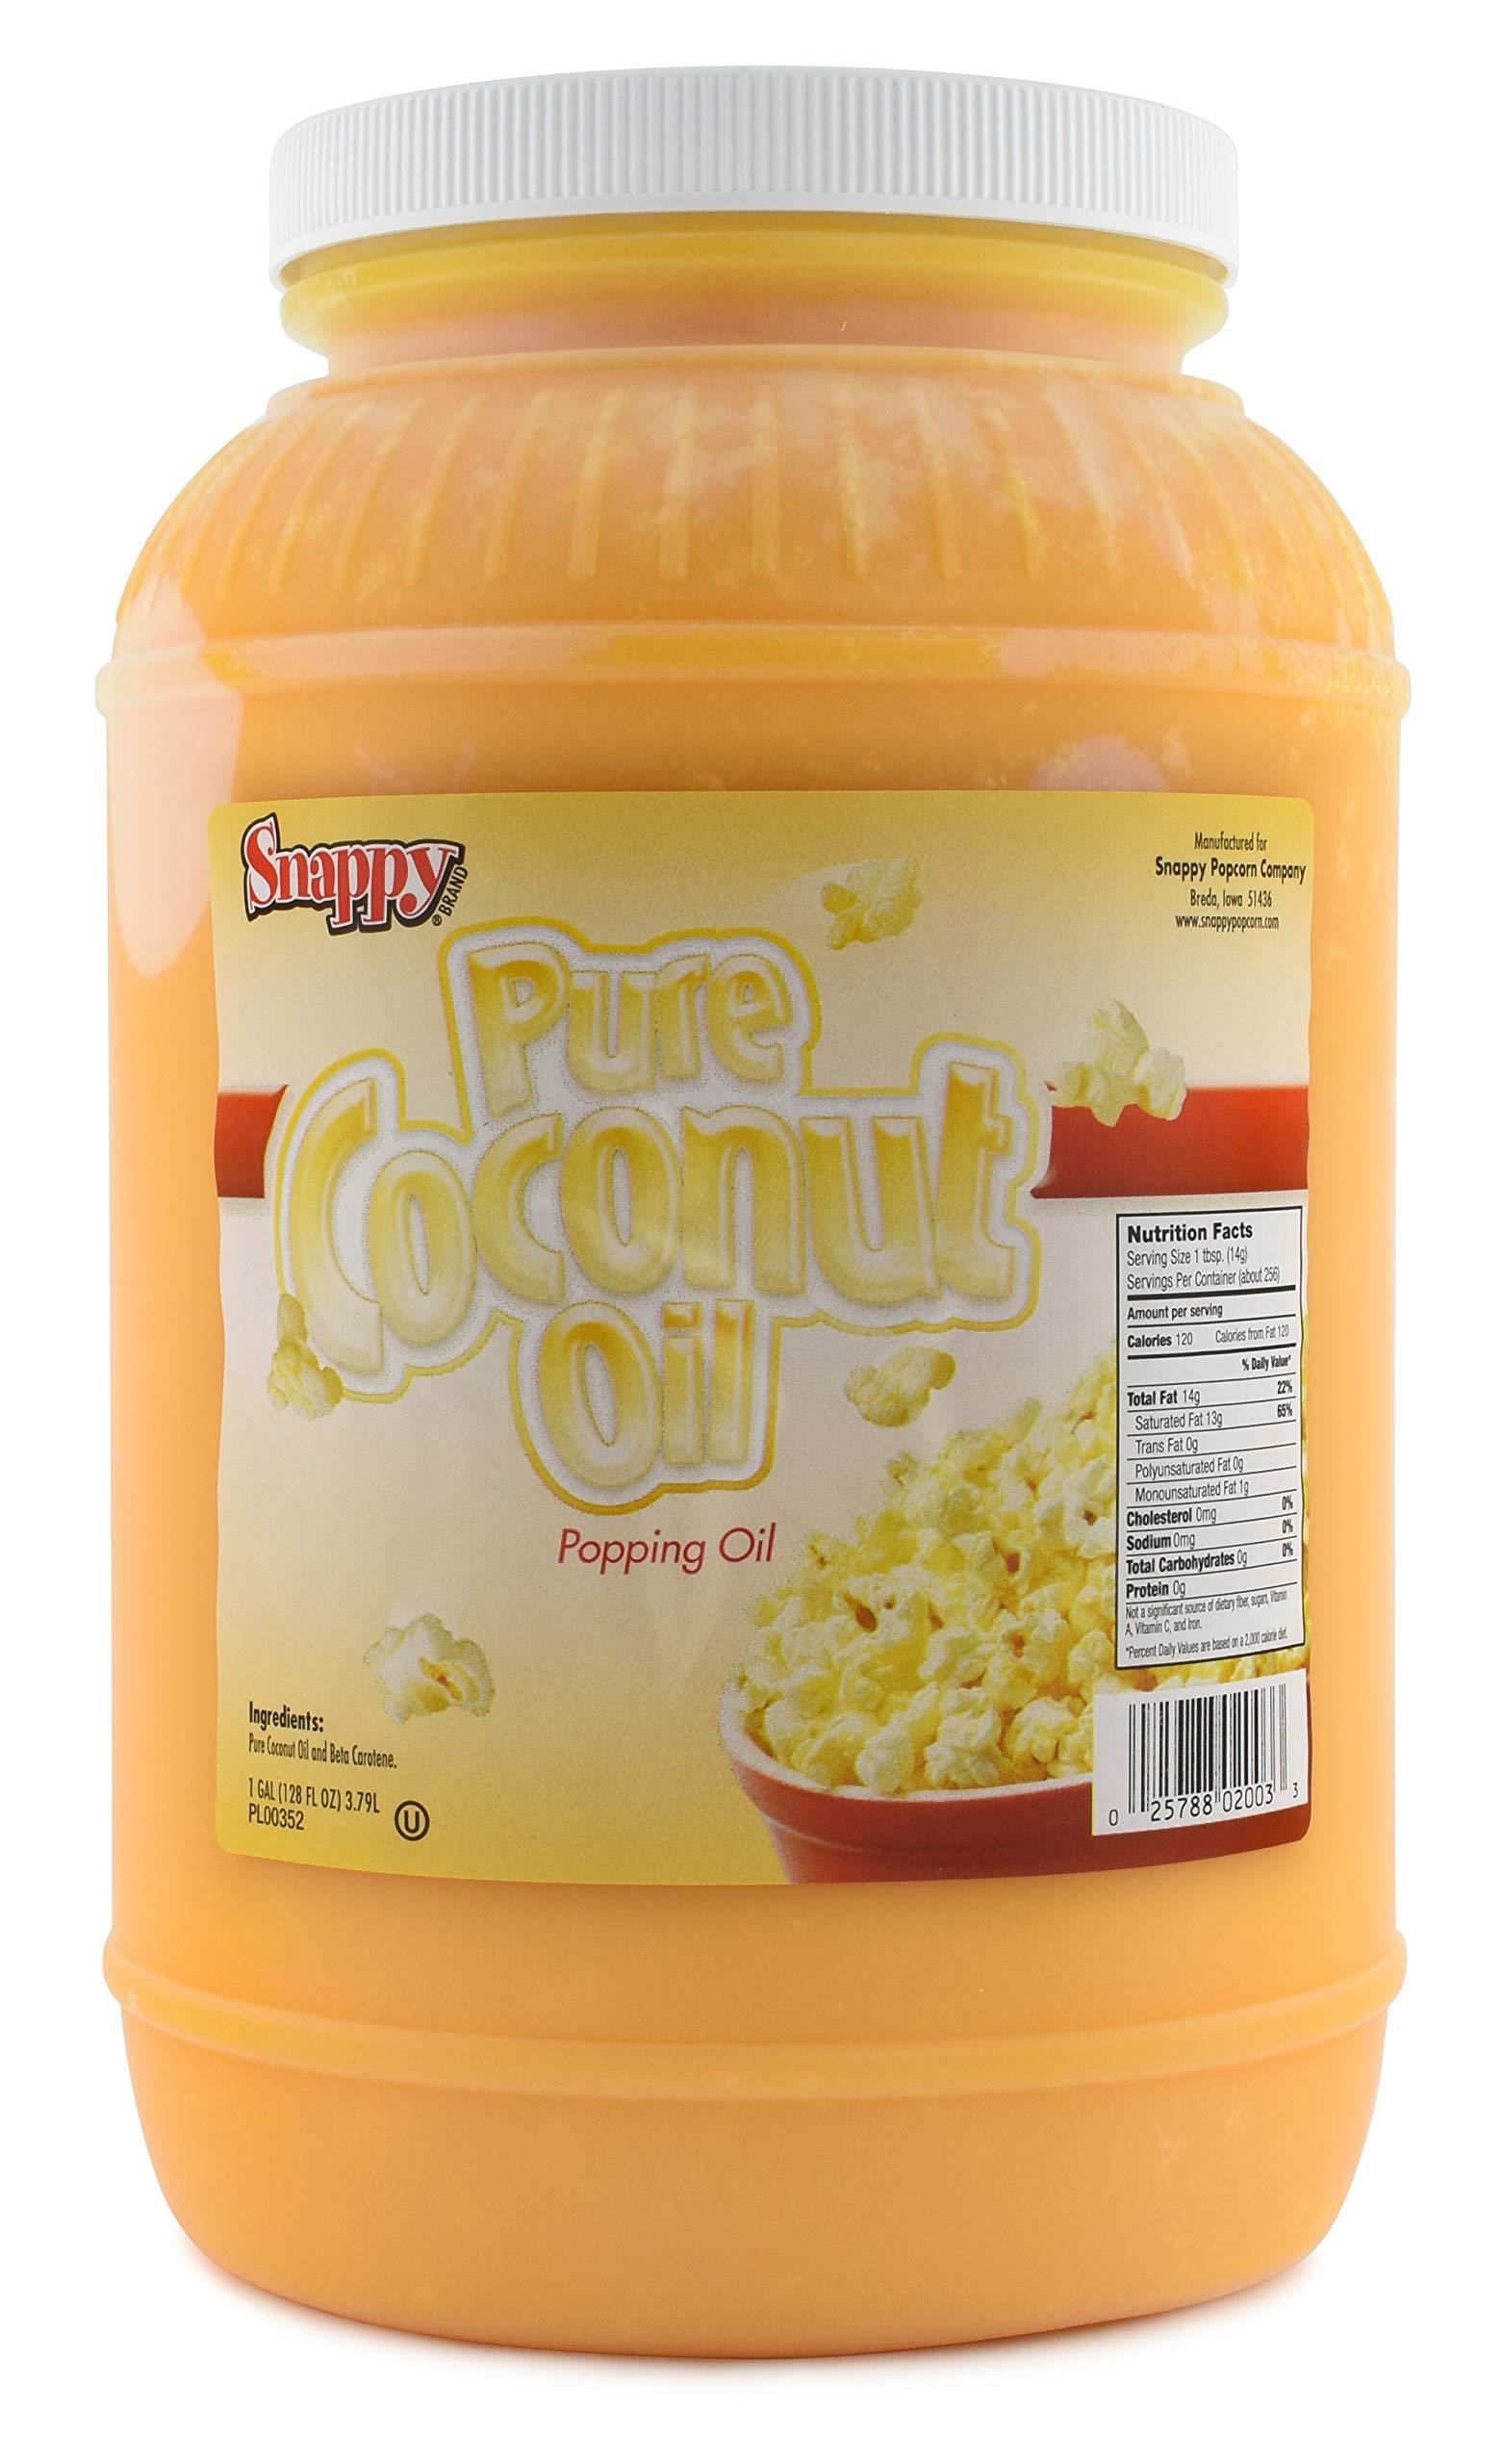 Snappy Popcorn Colored Coconut Oil, 1 Gallon by Snappy Popcorn